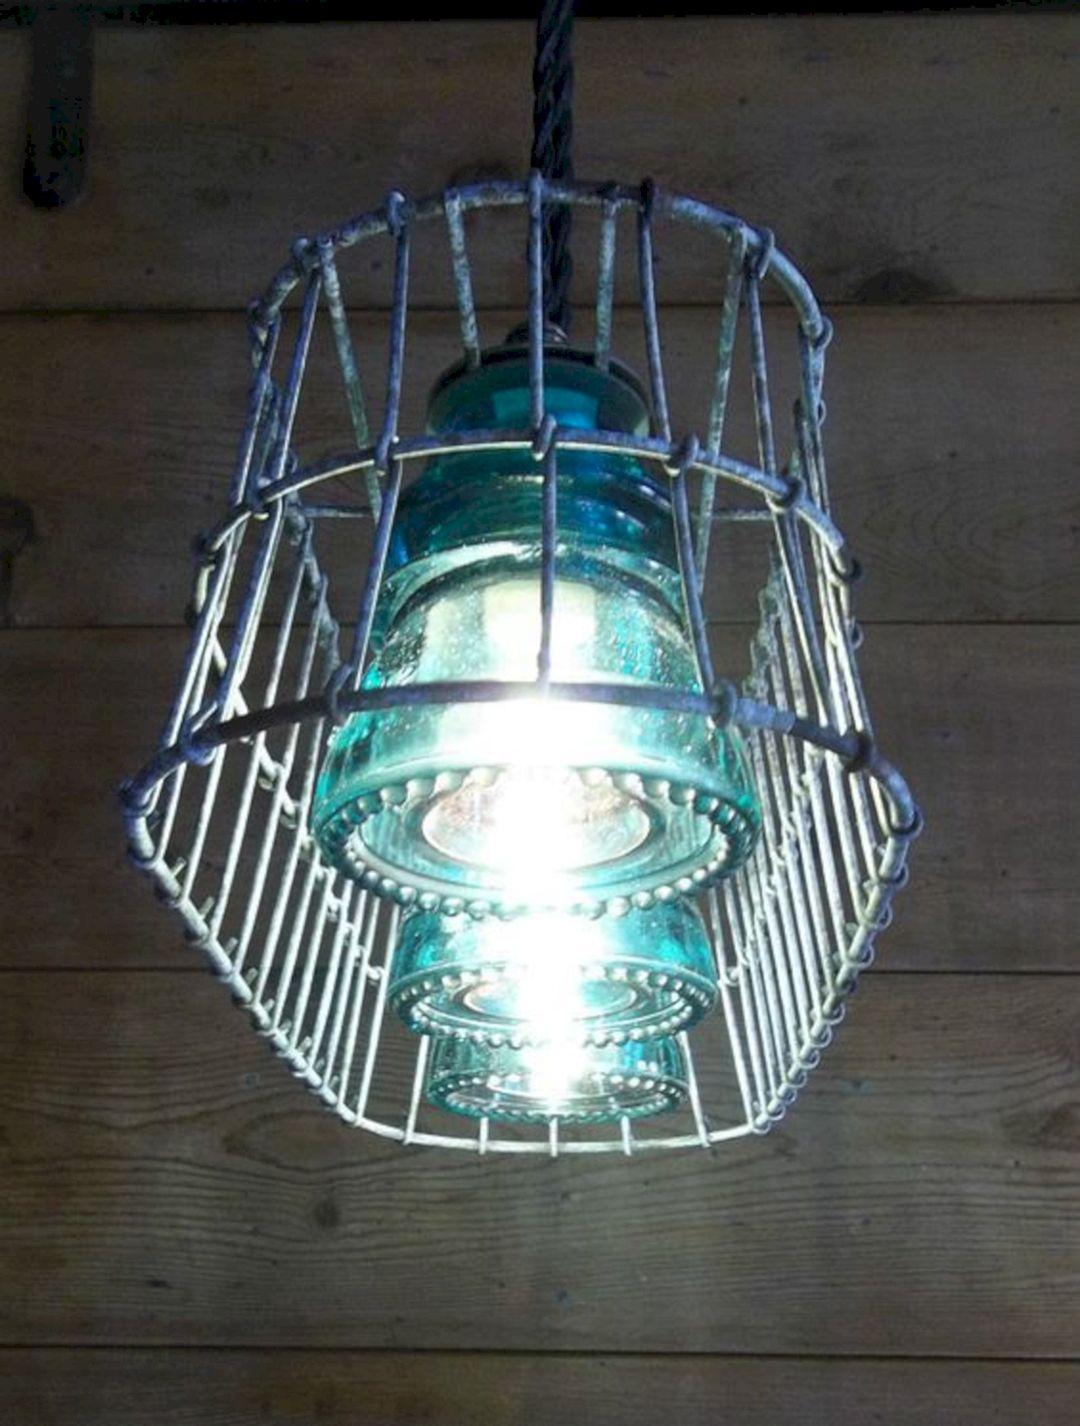 Burlap wire basket lights burlap wire basket lights for Burlap lights